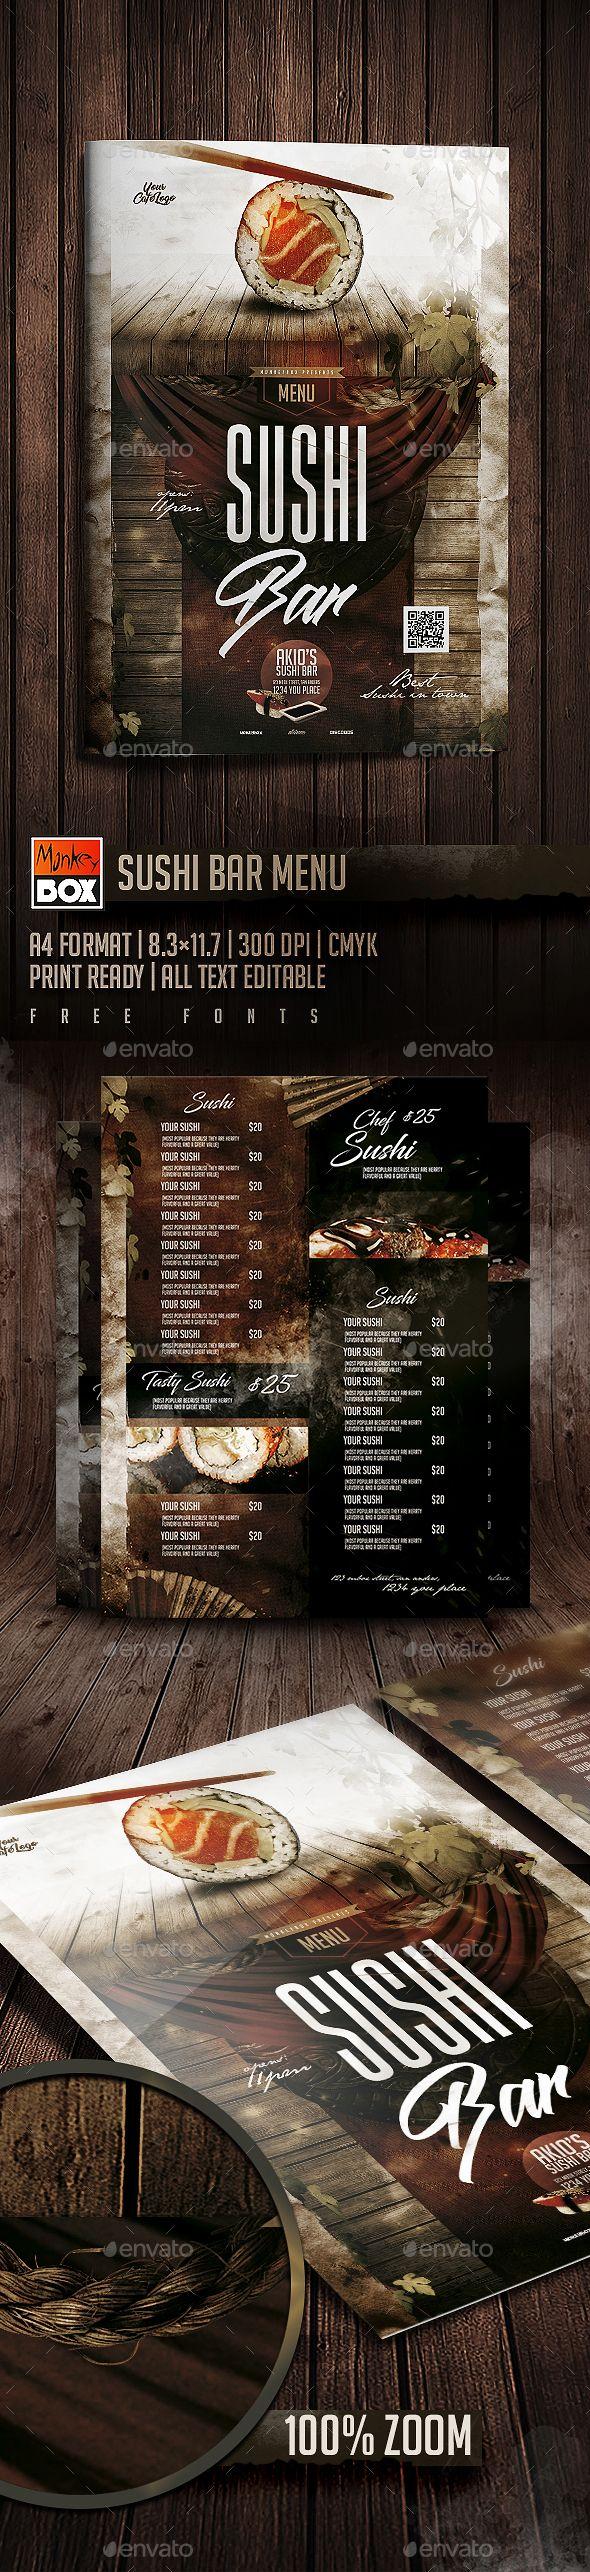 Sushi Bar Menu — Photoshop PSD #sushi #japanese food menu • Download ➝ https://graphicriver.net/item/sushi-bar-menu/19739766?ref=pxcr